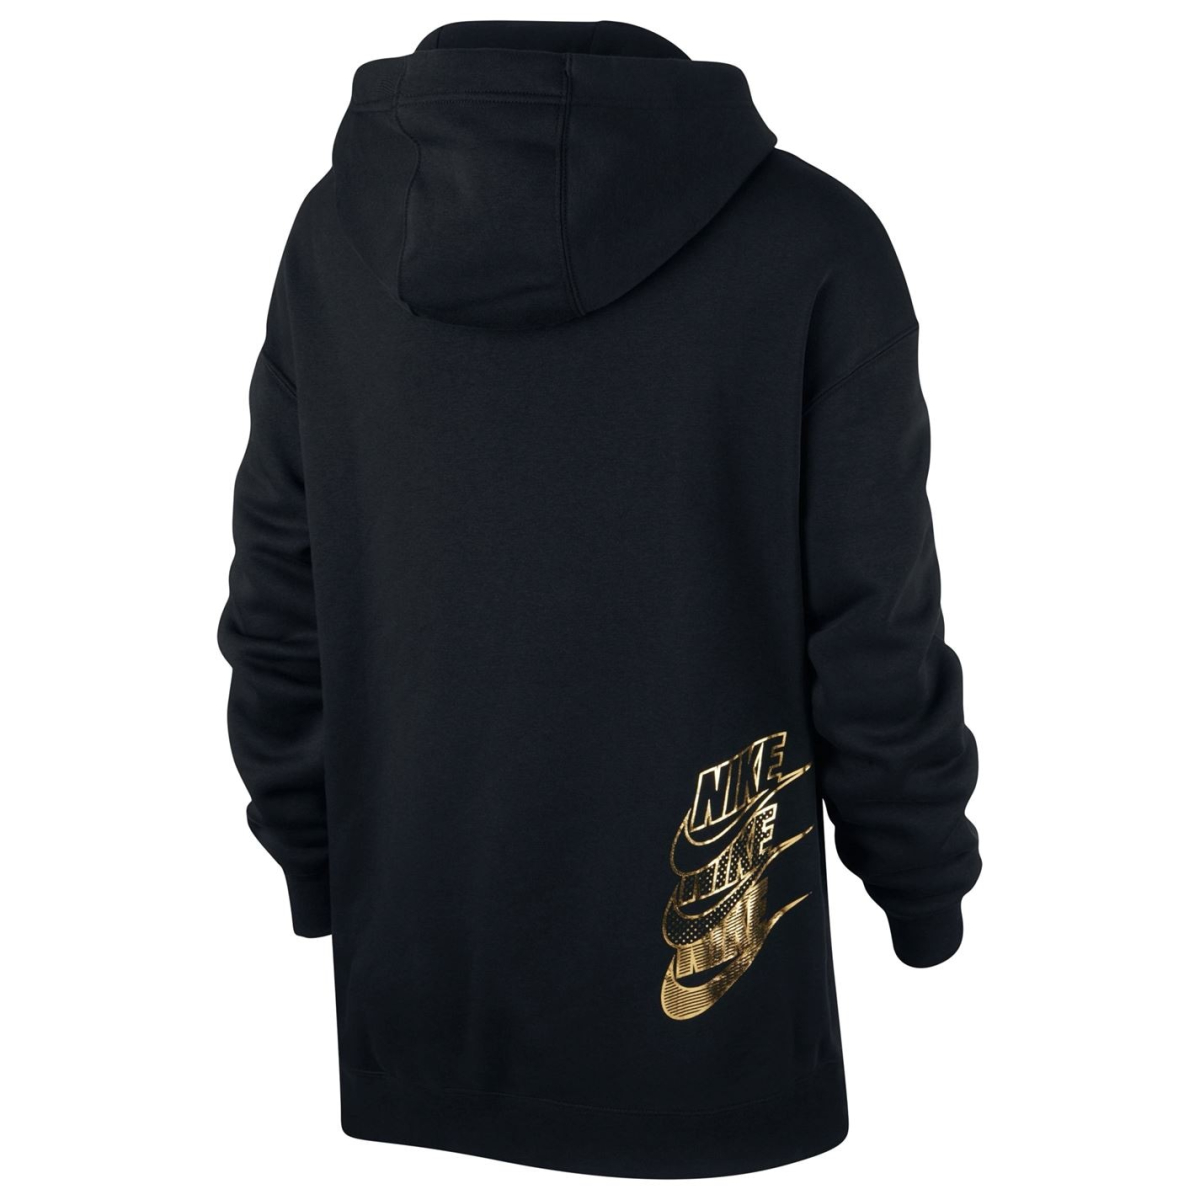 Nike Shine Kapuzenjacke Jacke Kapuzenpullover Damen Sweatshirt Pullover 4109